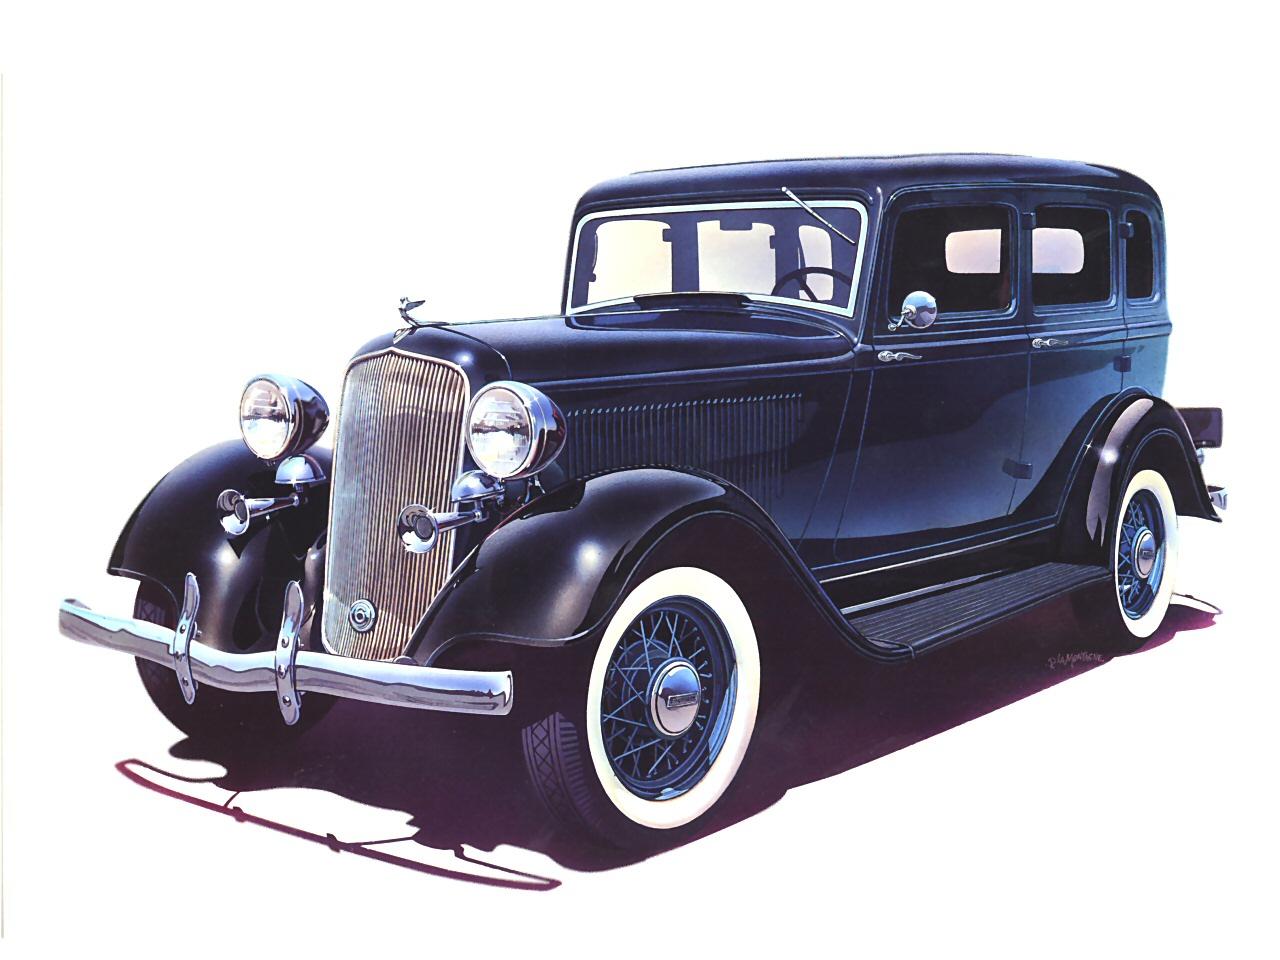 1933 plymouth 4 dr sedan autos post for 1933 plymouth 4 door sedan for sale